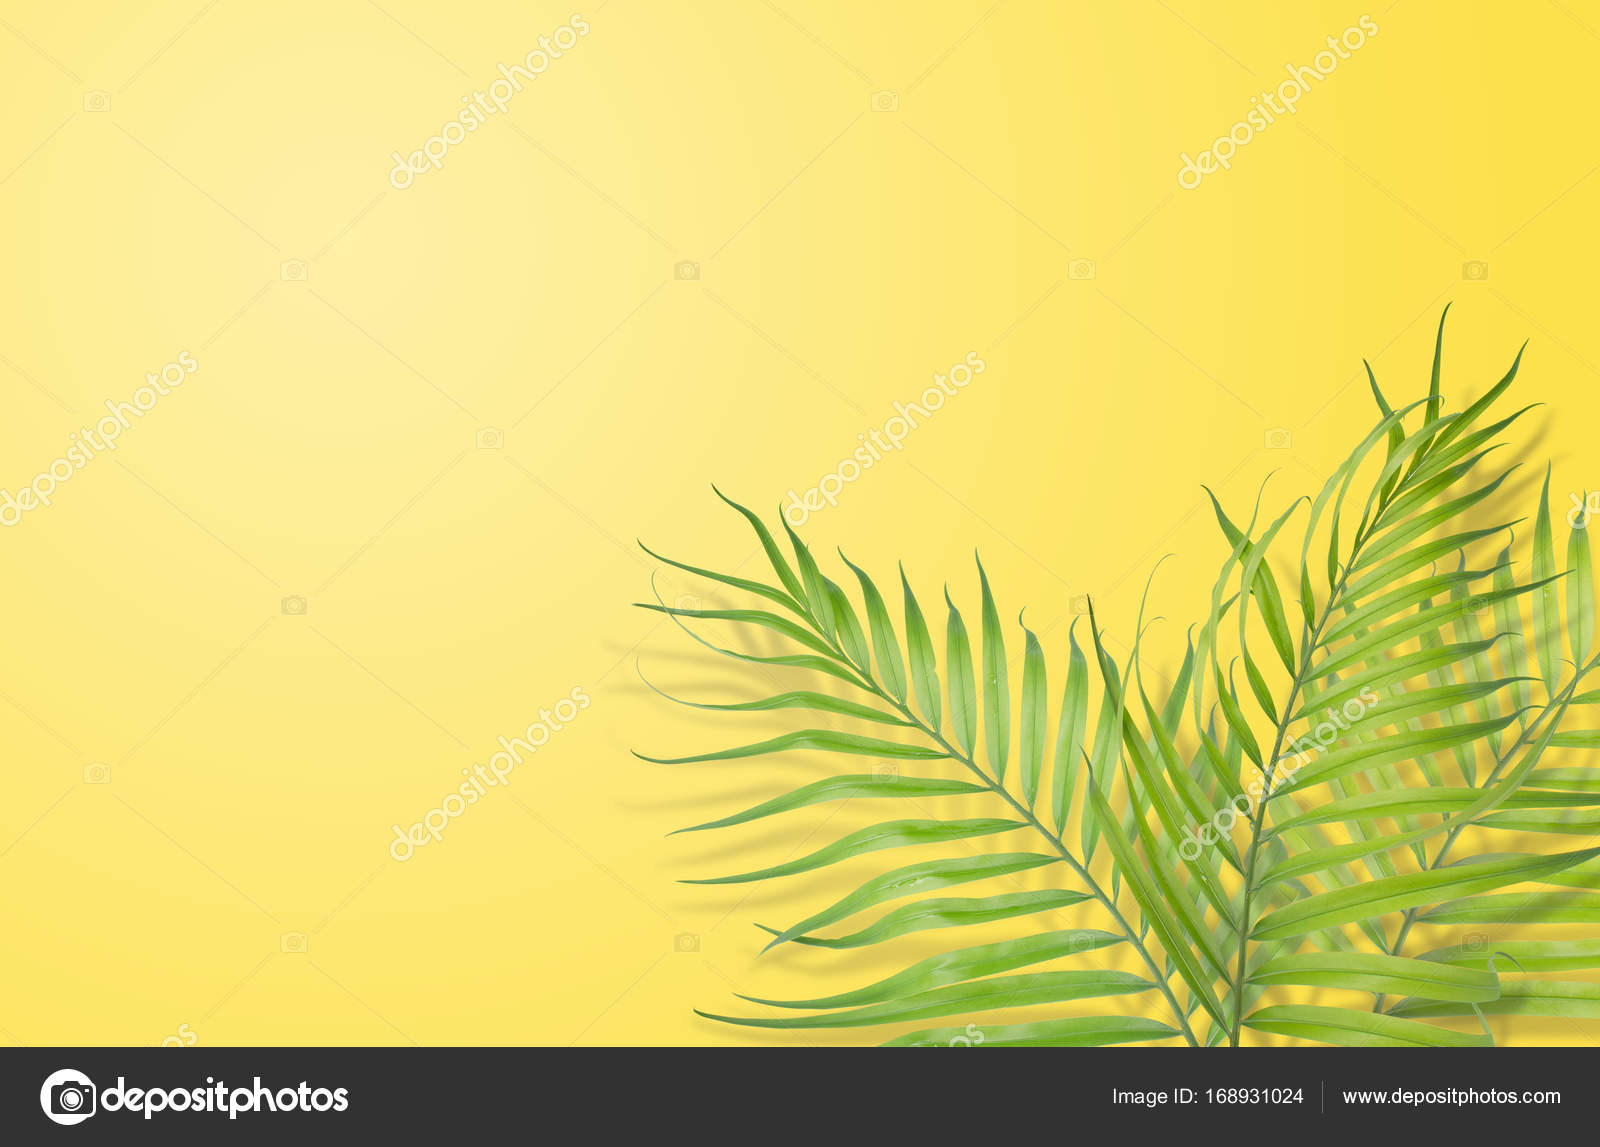 Tropical Palm Leaves On Yellow Background Minimal Nature Summe Stock Photo C Kittikornph 168931024 831 tropical leaves white background stock illustrations and clipart. https depositphotos com 168931024 stock photo tropical palm leaves on yellow html